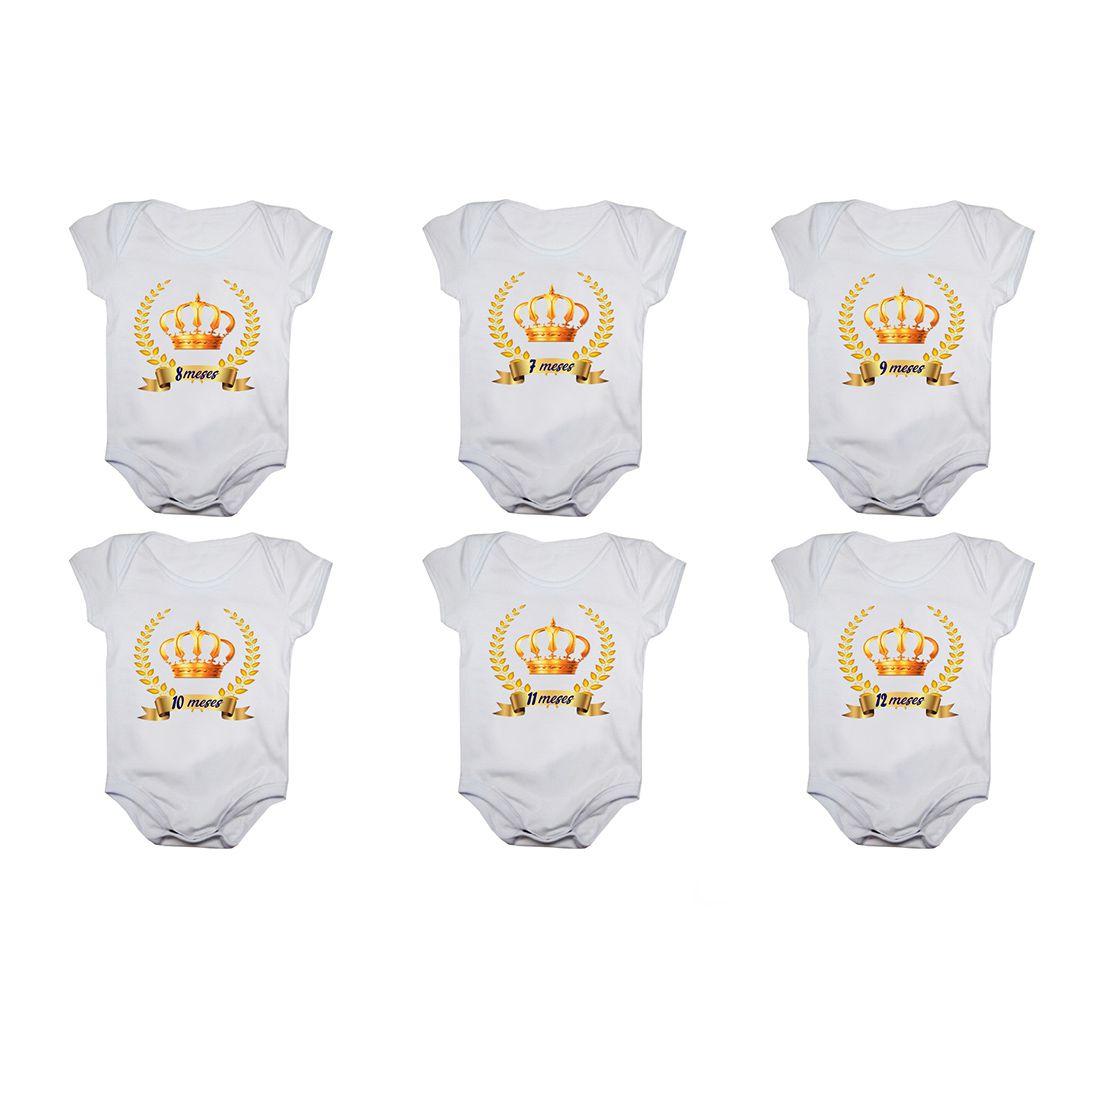 Kit body bebê mesversario manga curta estampa coroa príncipe 12 bodies 1 a 12 meses